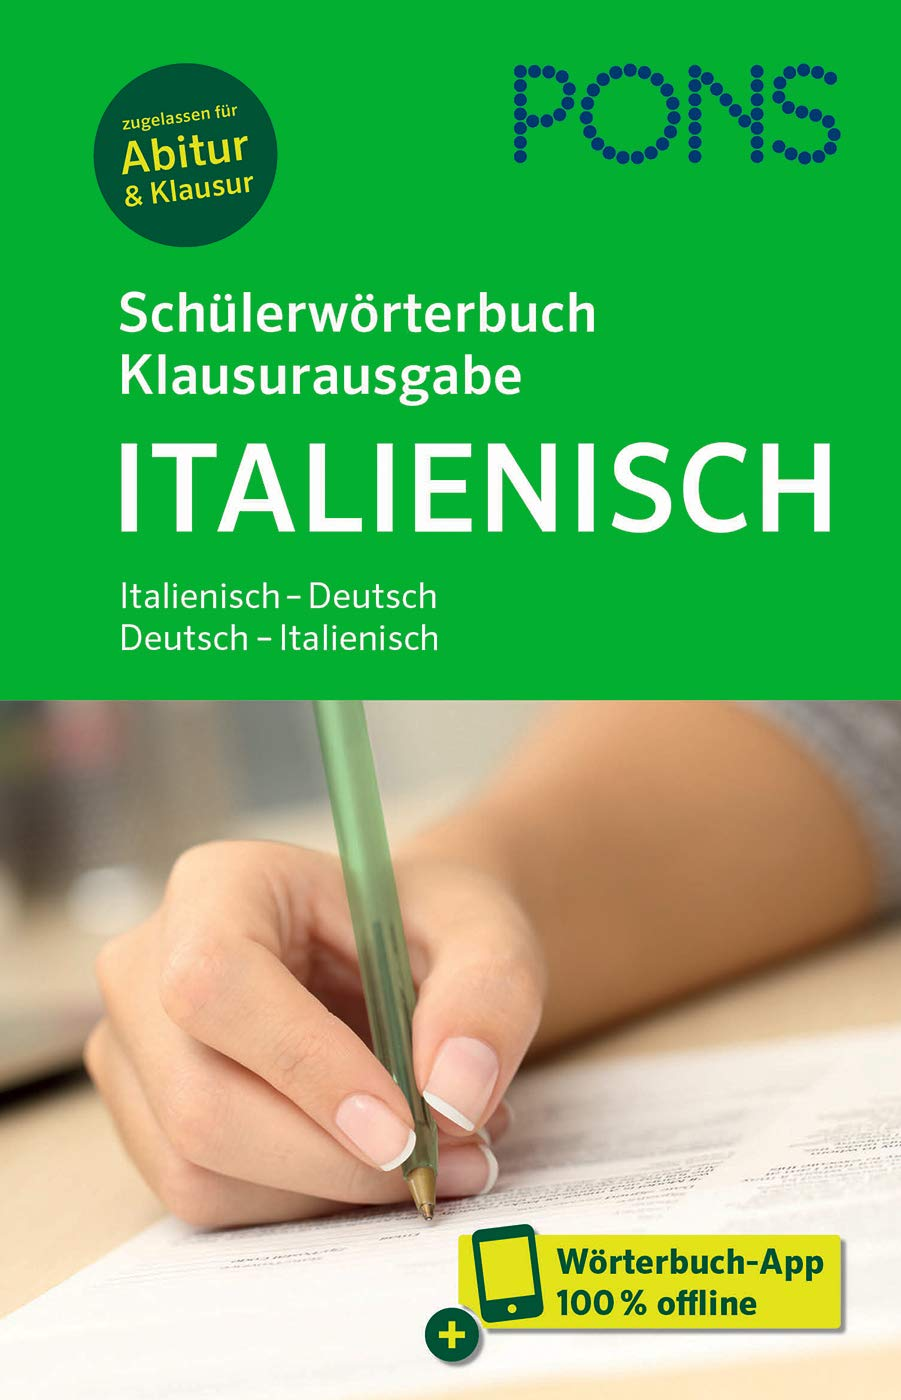 PONS Schülerwörterbuch Klausurausgabe Italienisch  Italienisch Deutsch   Deutsch Italienisch. Mit Wörterbuch App.